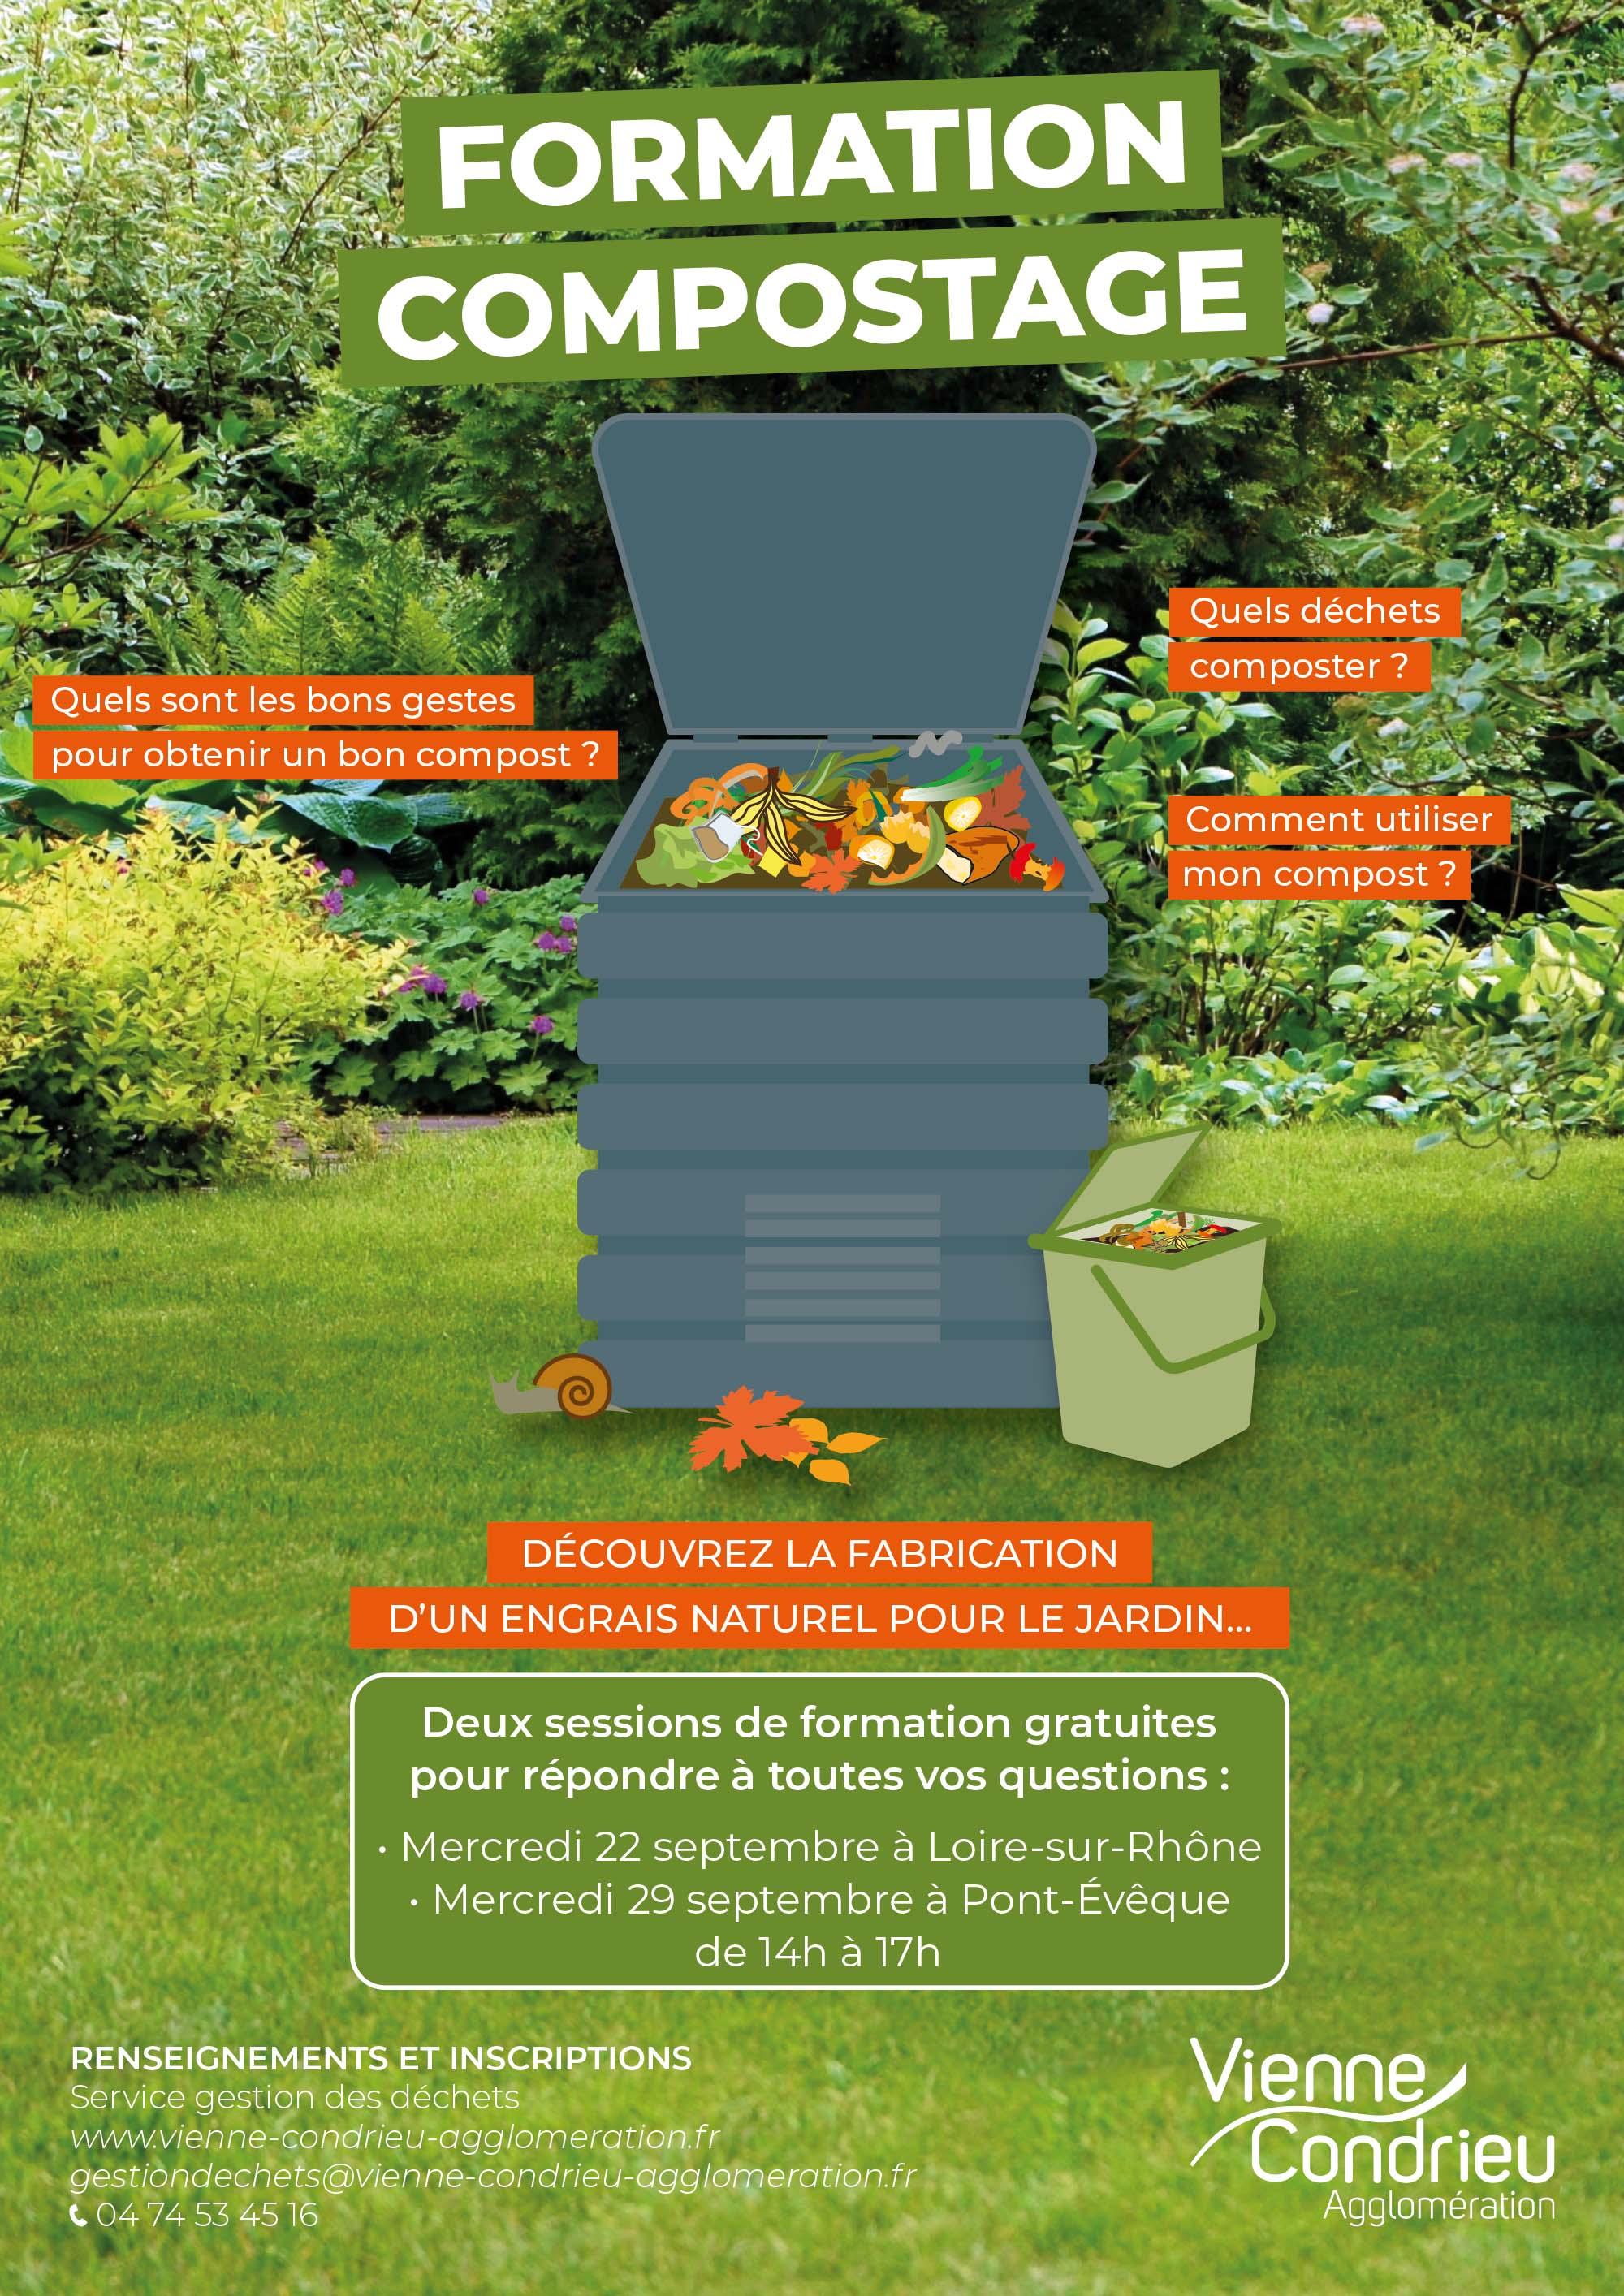 formation-compostage2021.jpg